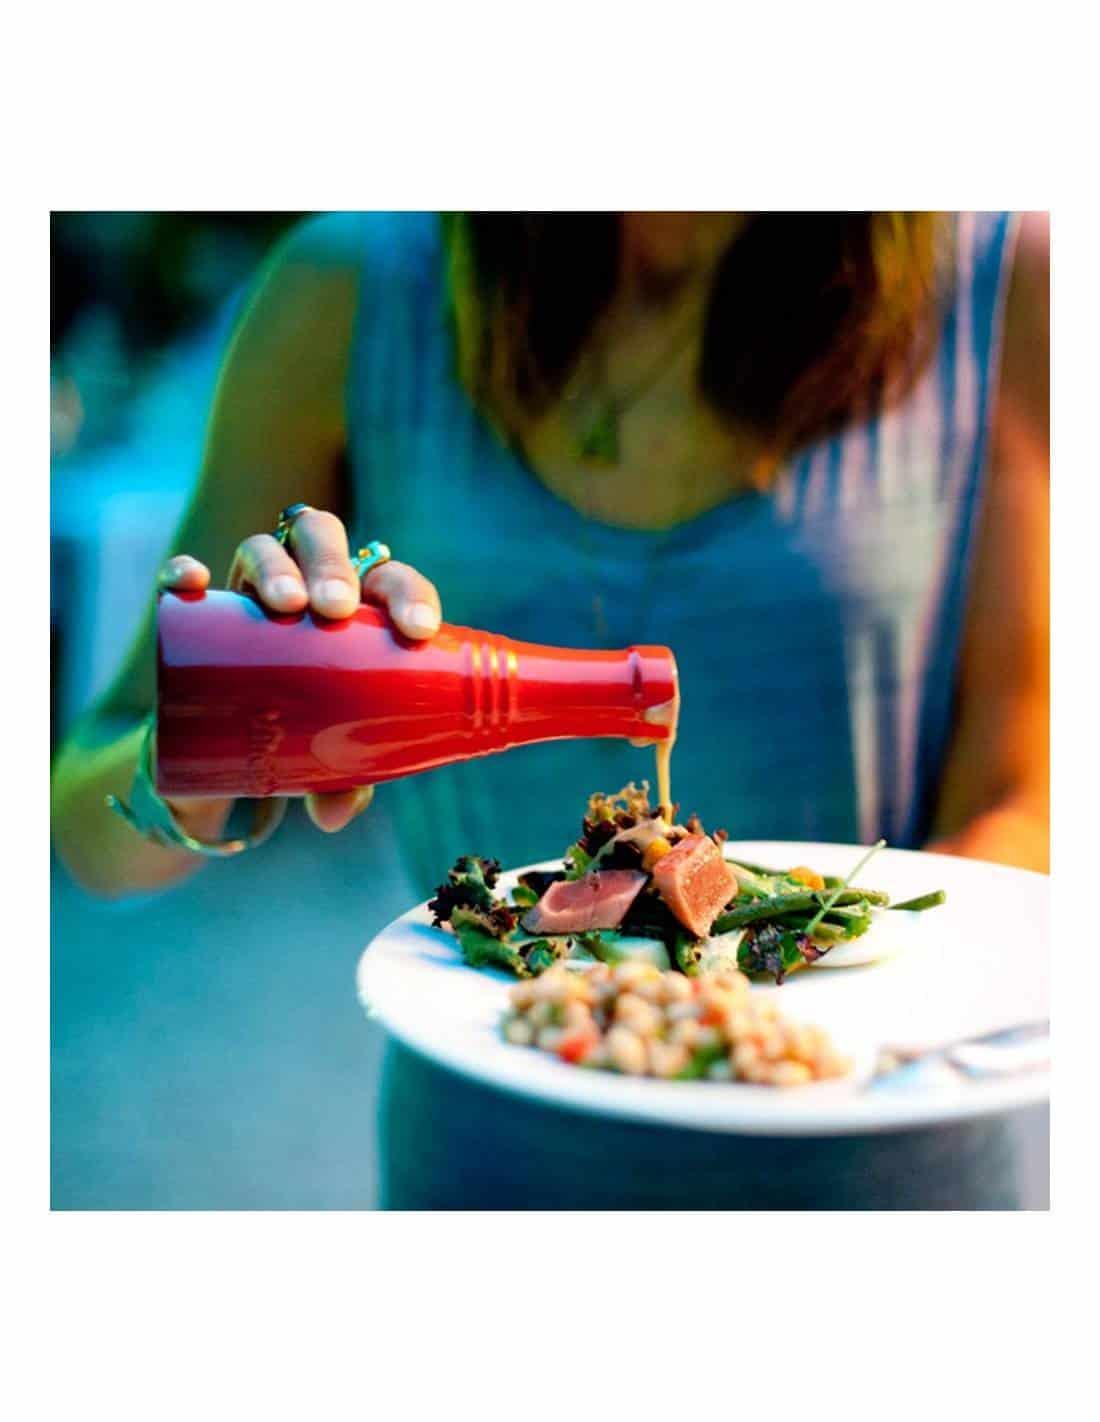 Le Creuset Stoneware Oil and Vinegar Bottle Set - Cerise | MIMOCOOK ...